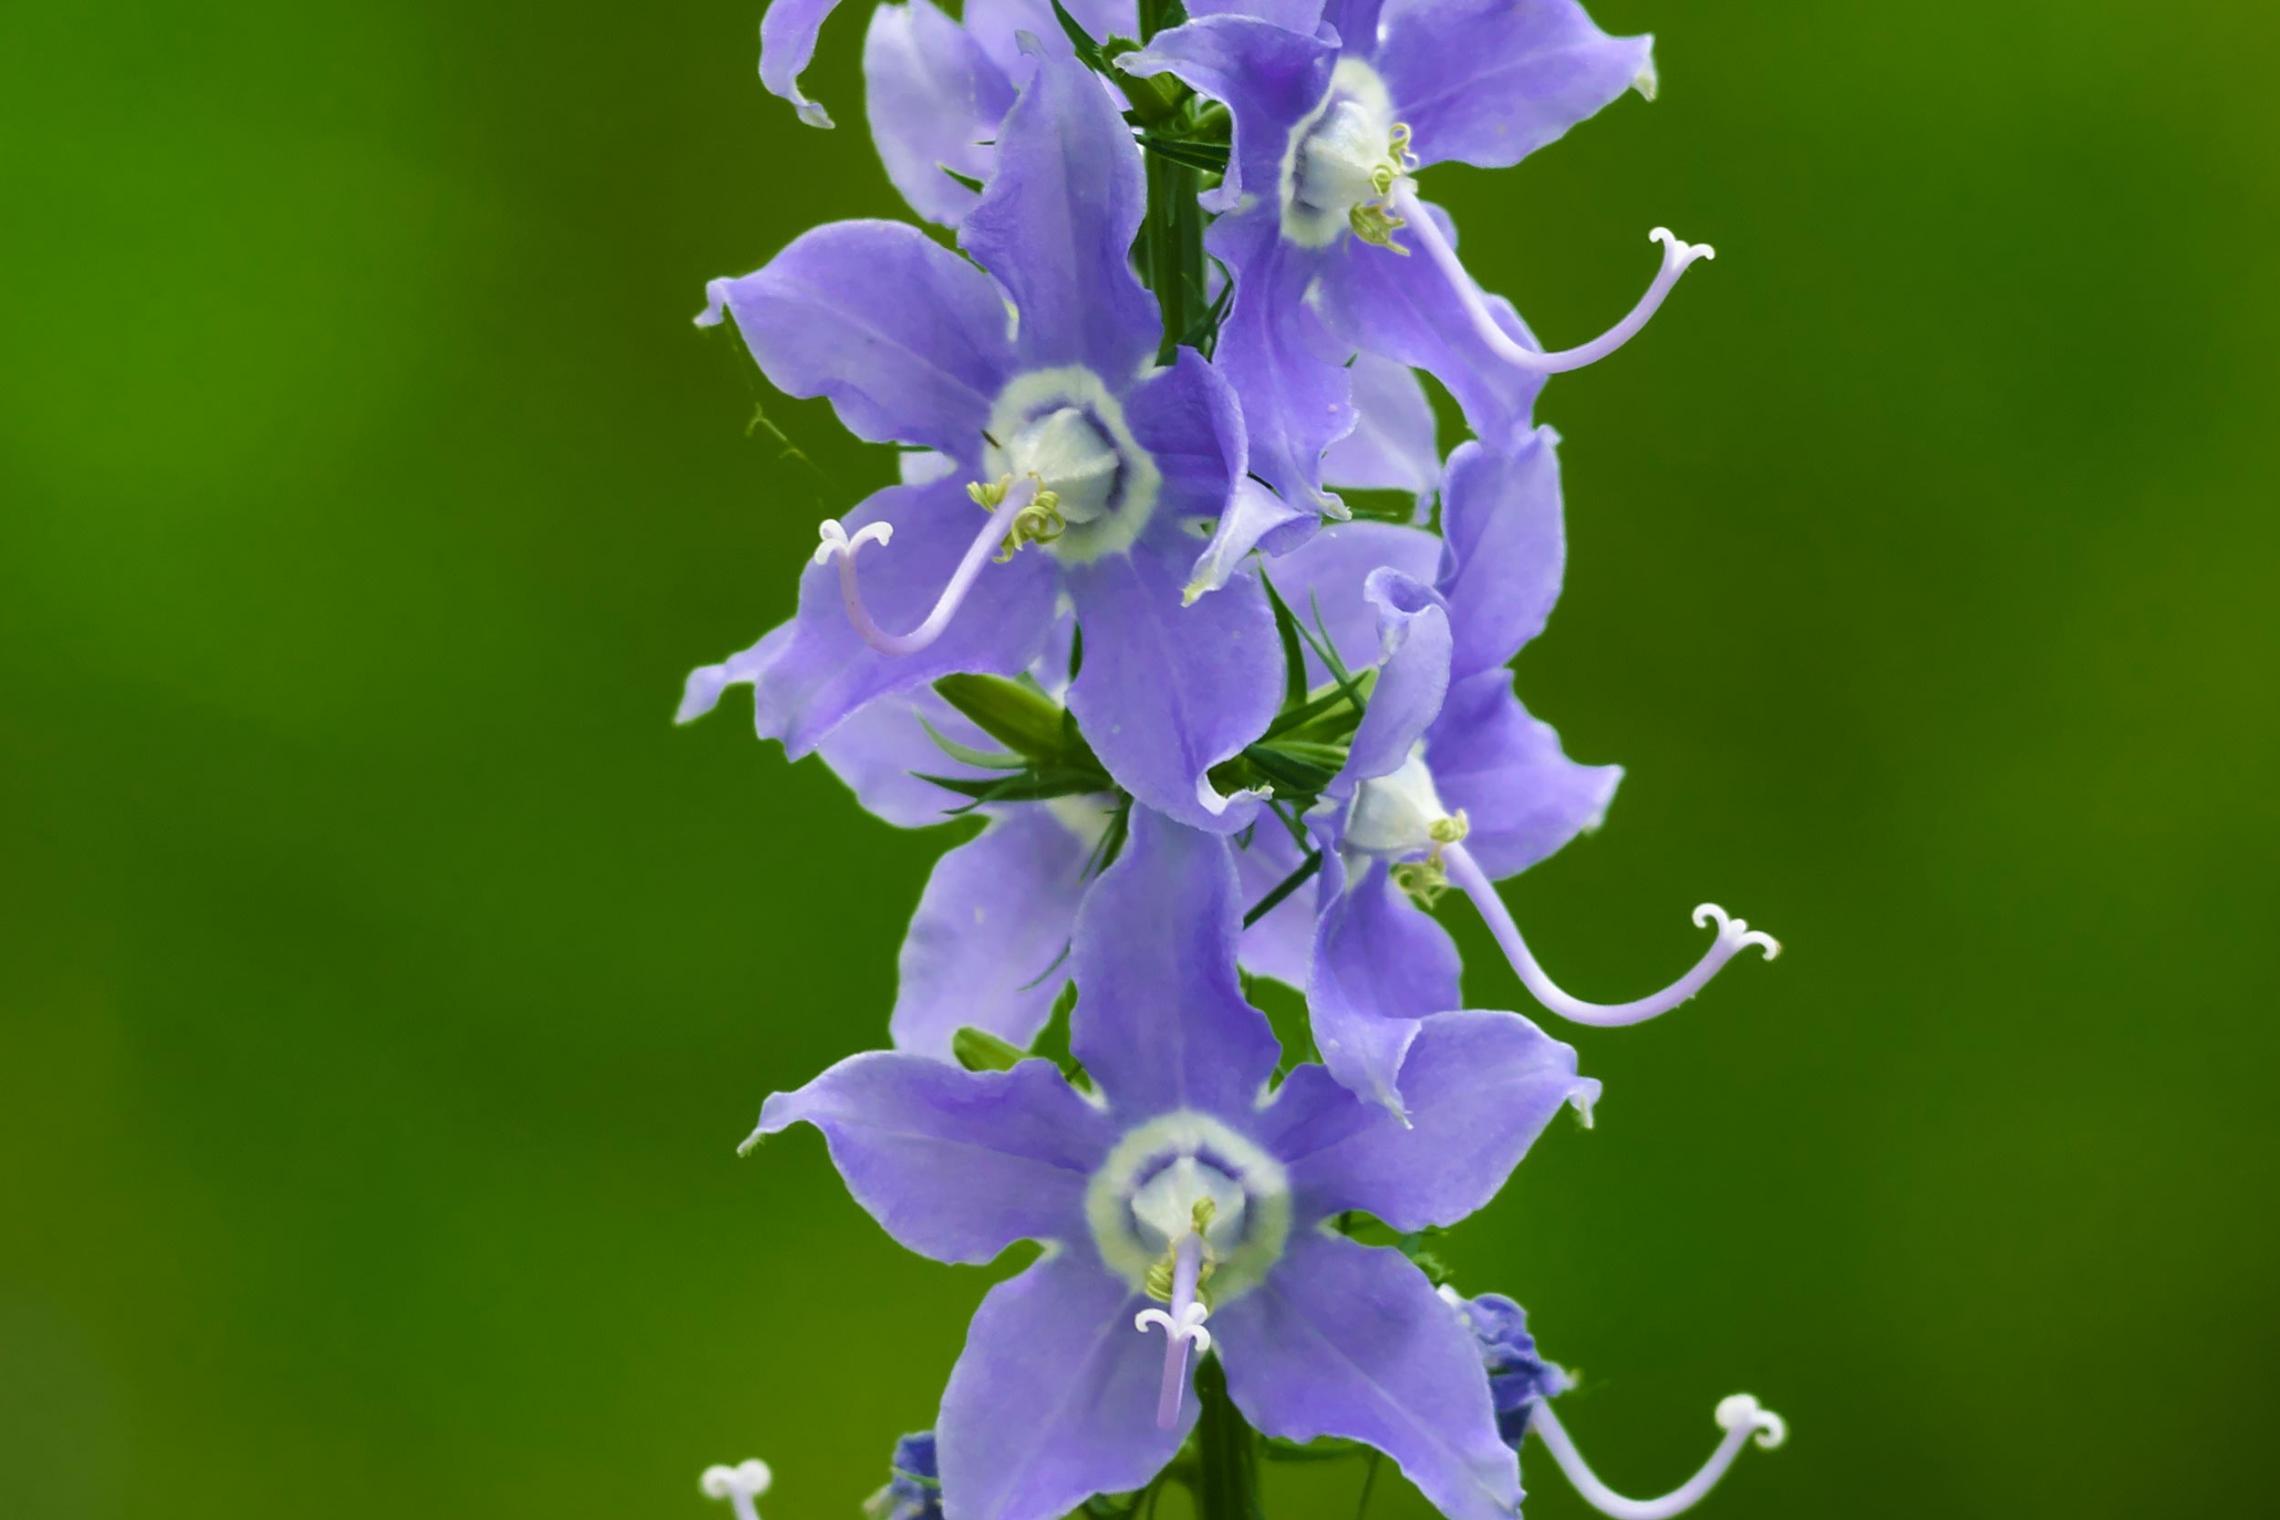 The American bellflower is native to Virginia.